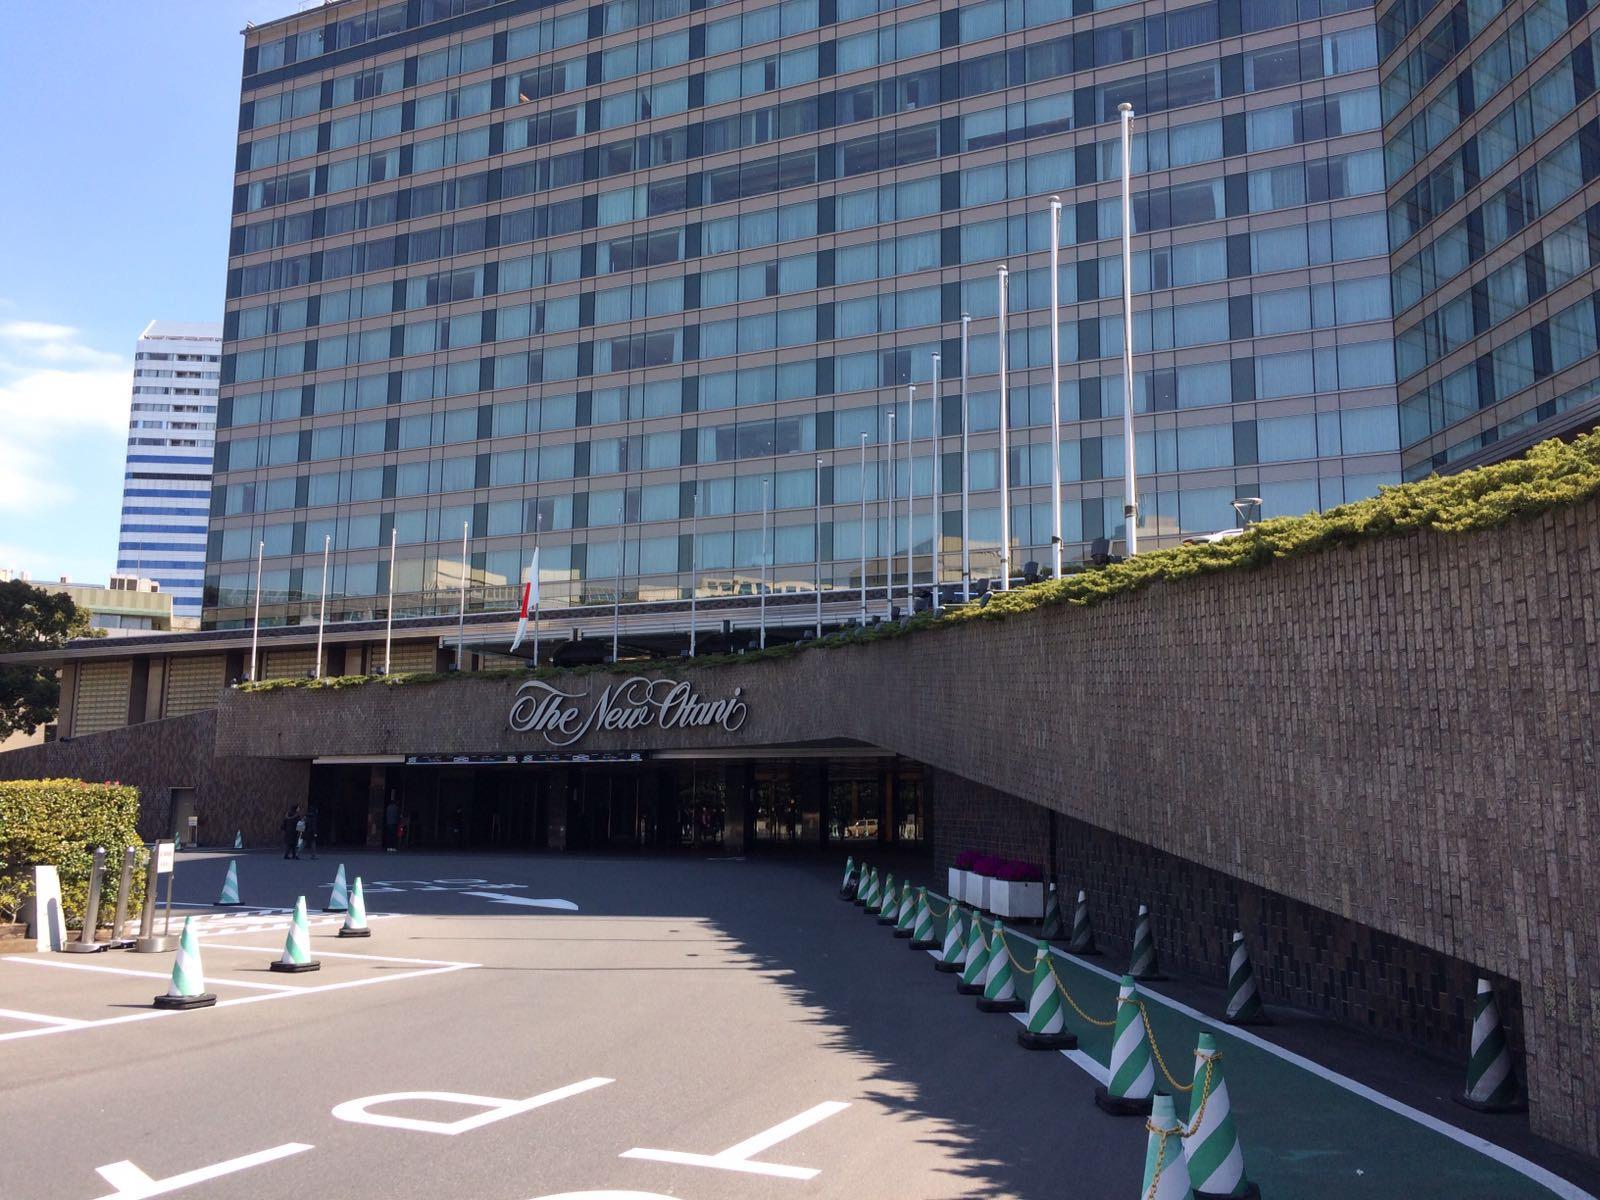 james bond locations osato 39 s hq hotel new otani tokyo. Black Bedroom Furniture Sets. Home Design Ideas